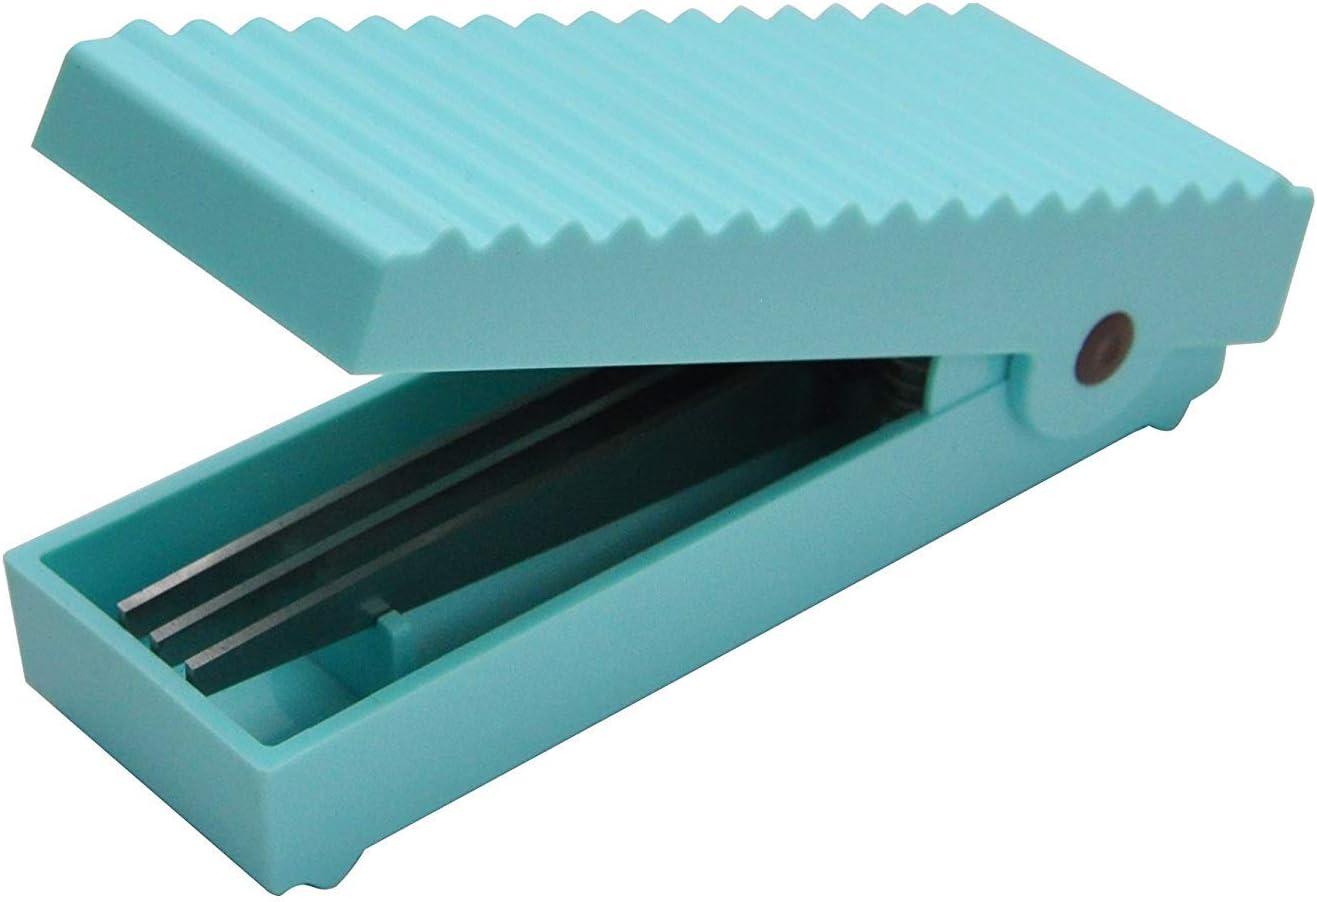 HARAC Handy Paper Shredder Fringe Scissors Manual Safe Document Chipper for Office and Household Use (Blue)